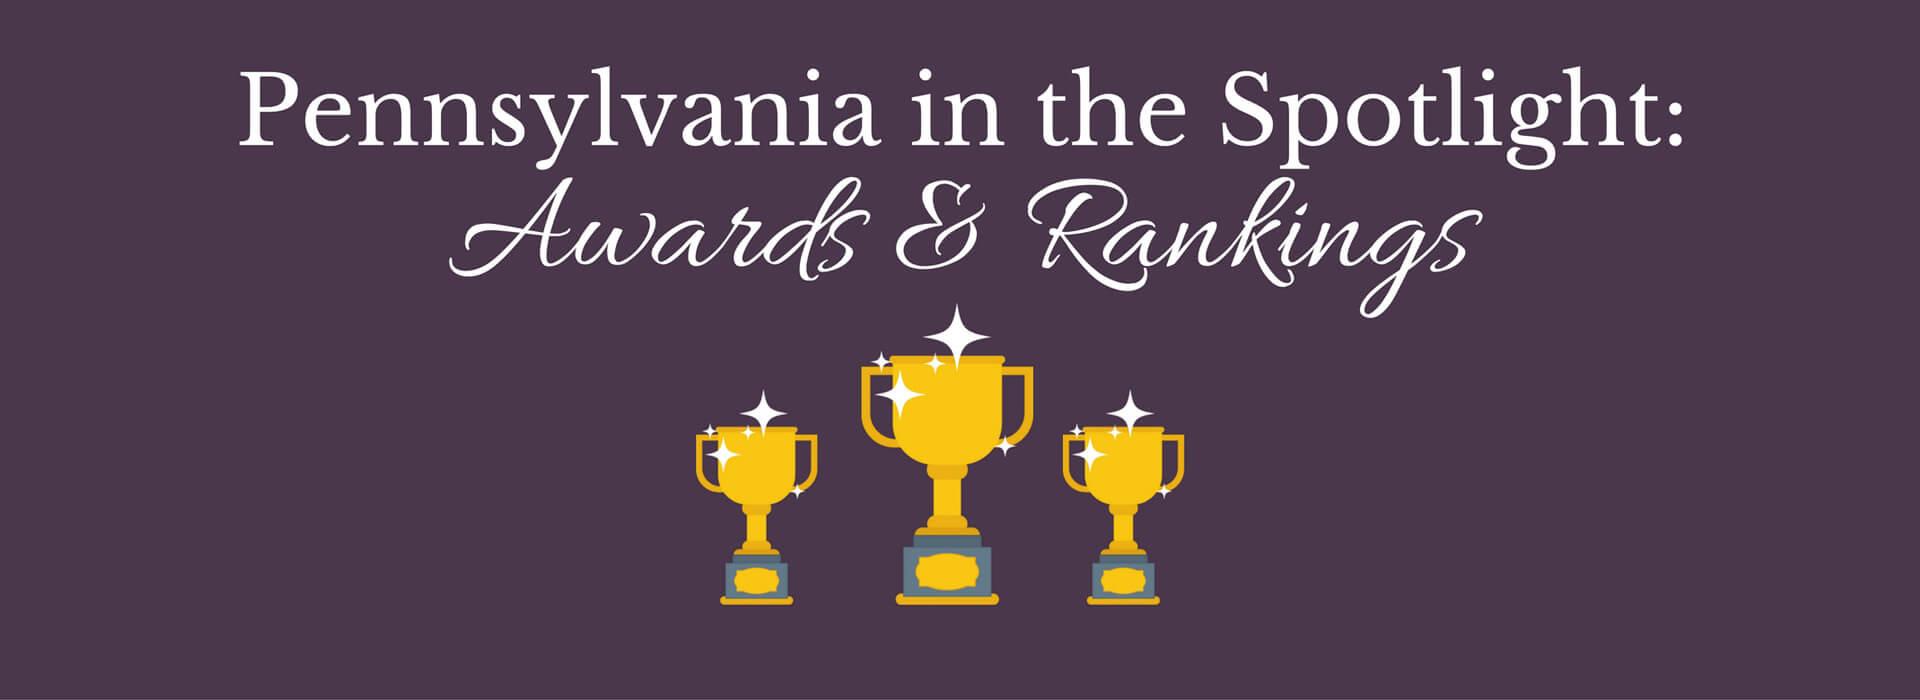 Pennsylvania Awards & Rankings (1)